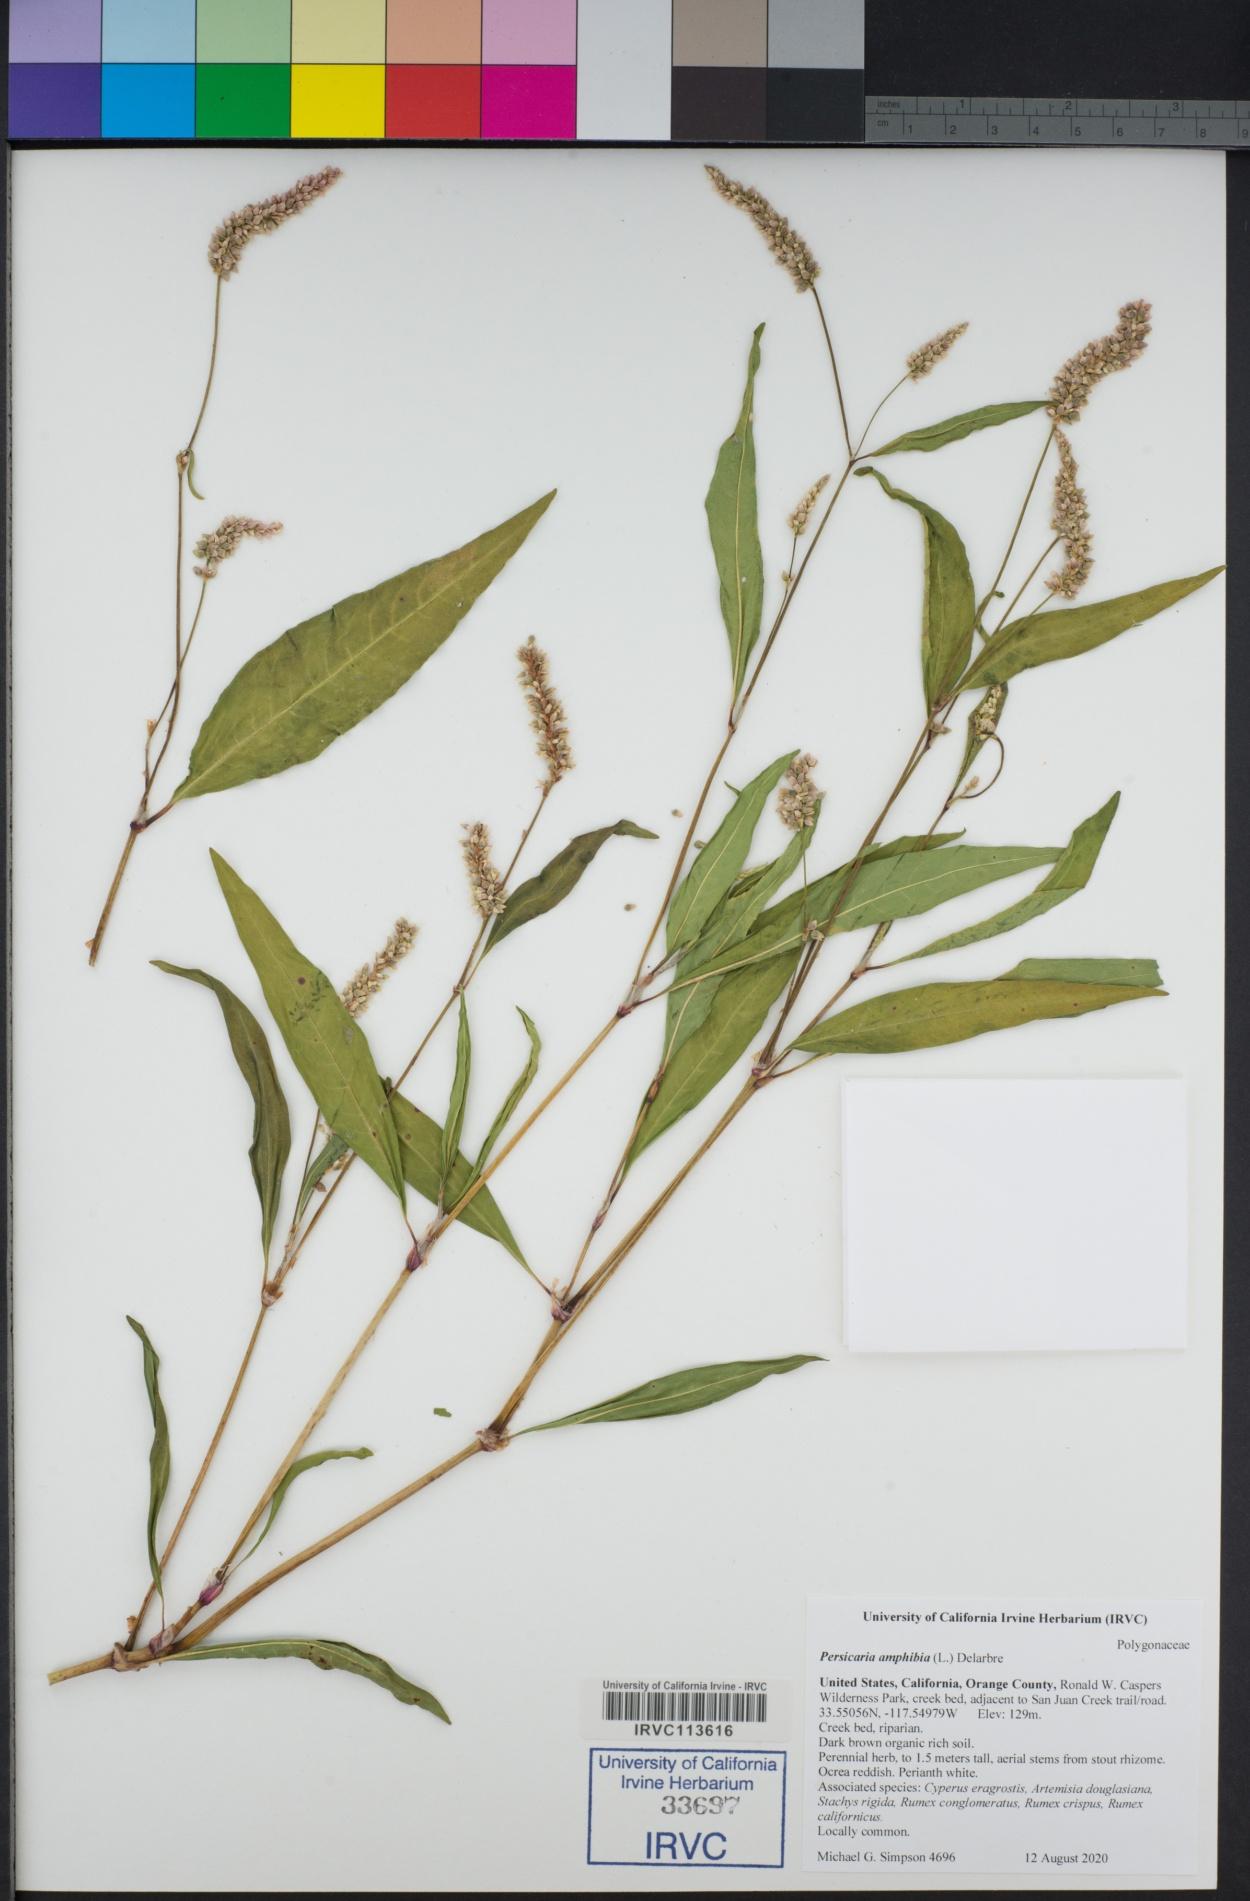 Polygonaceae image